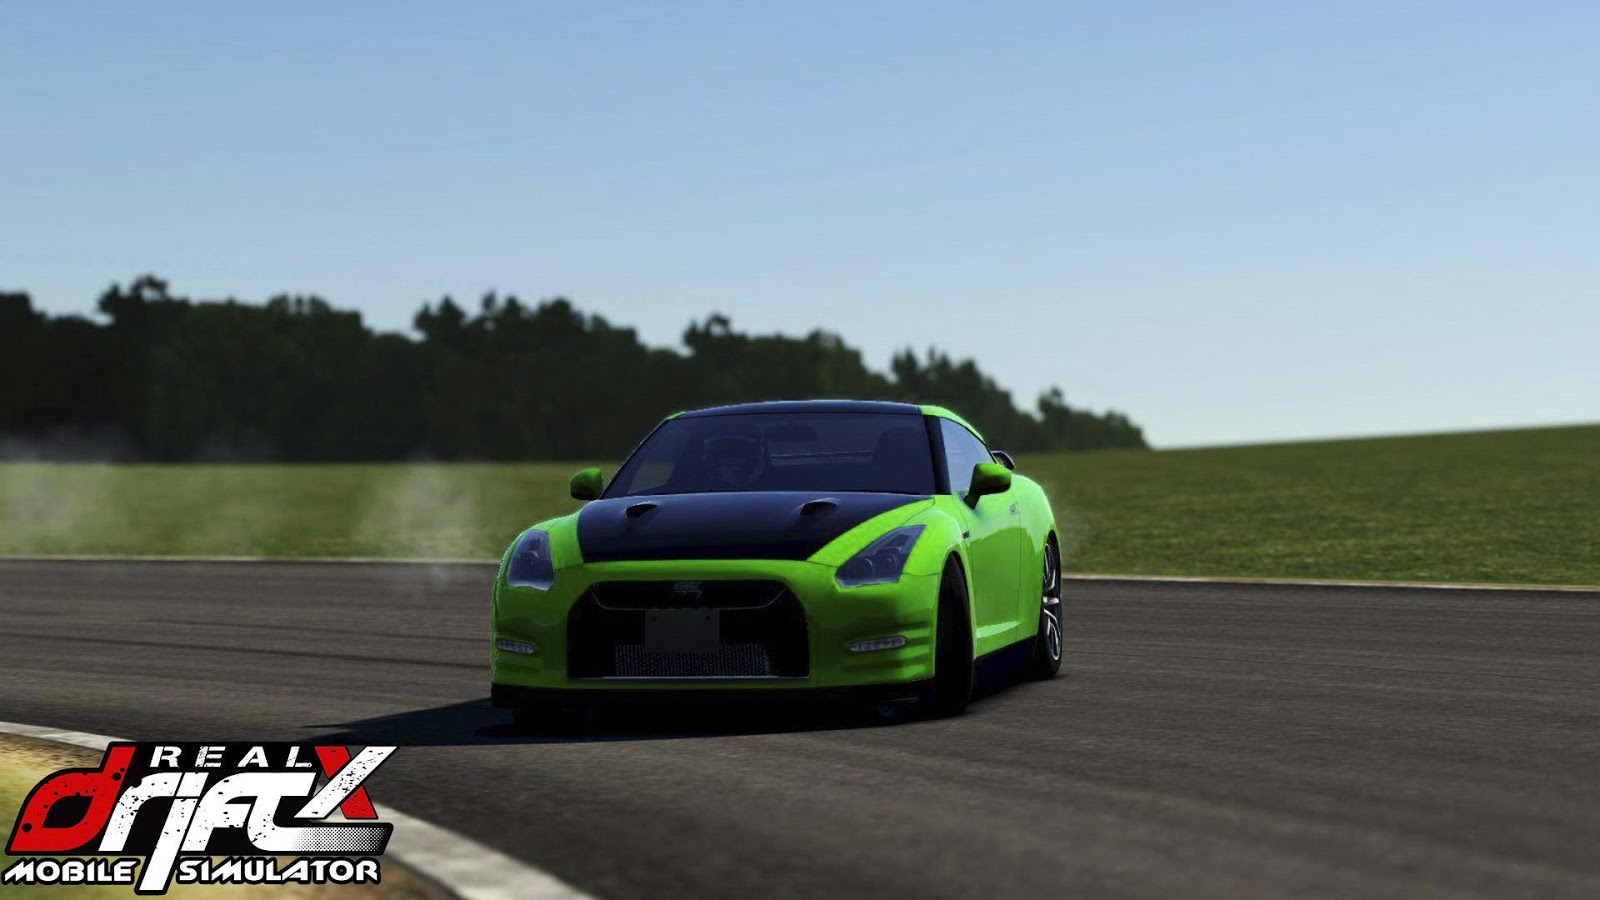 Real Drift X Car Racing 1 3 1 APK Download - Android Racing